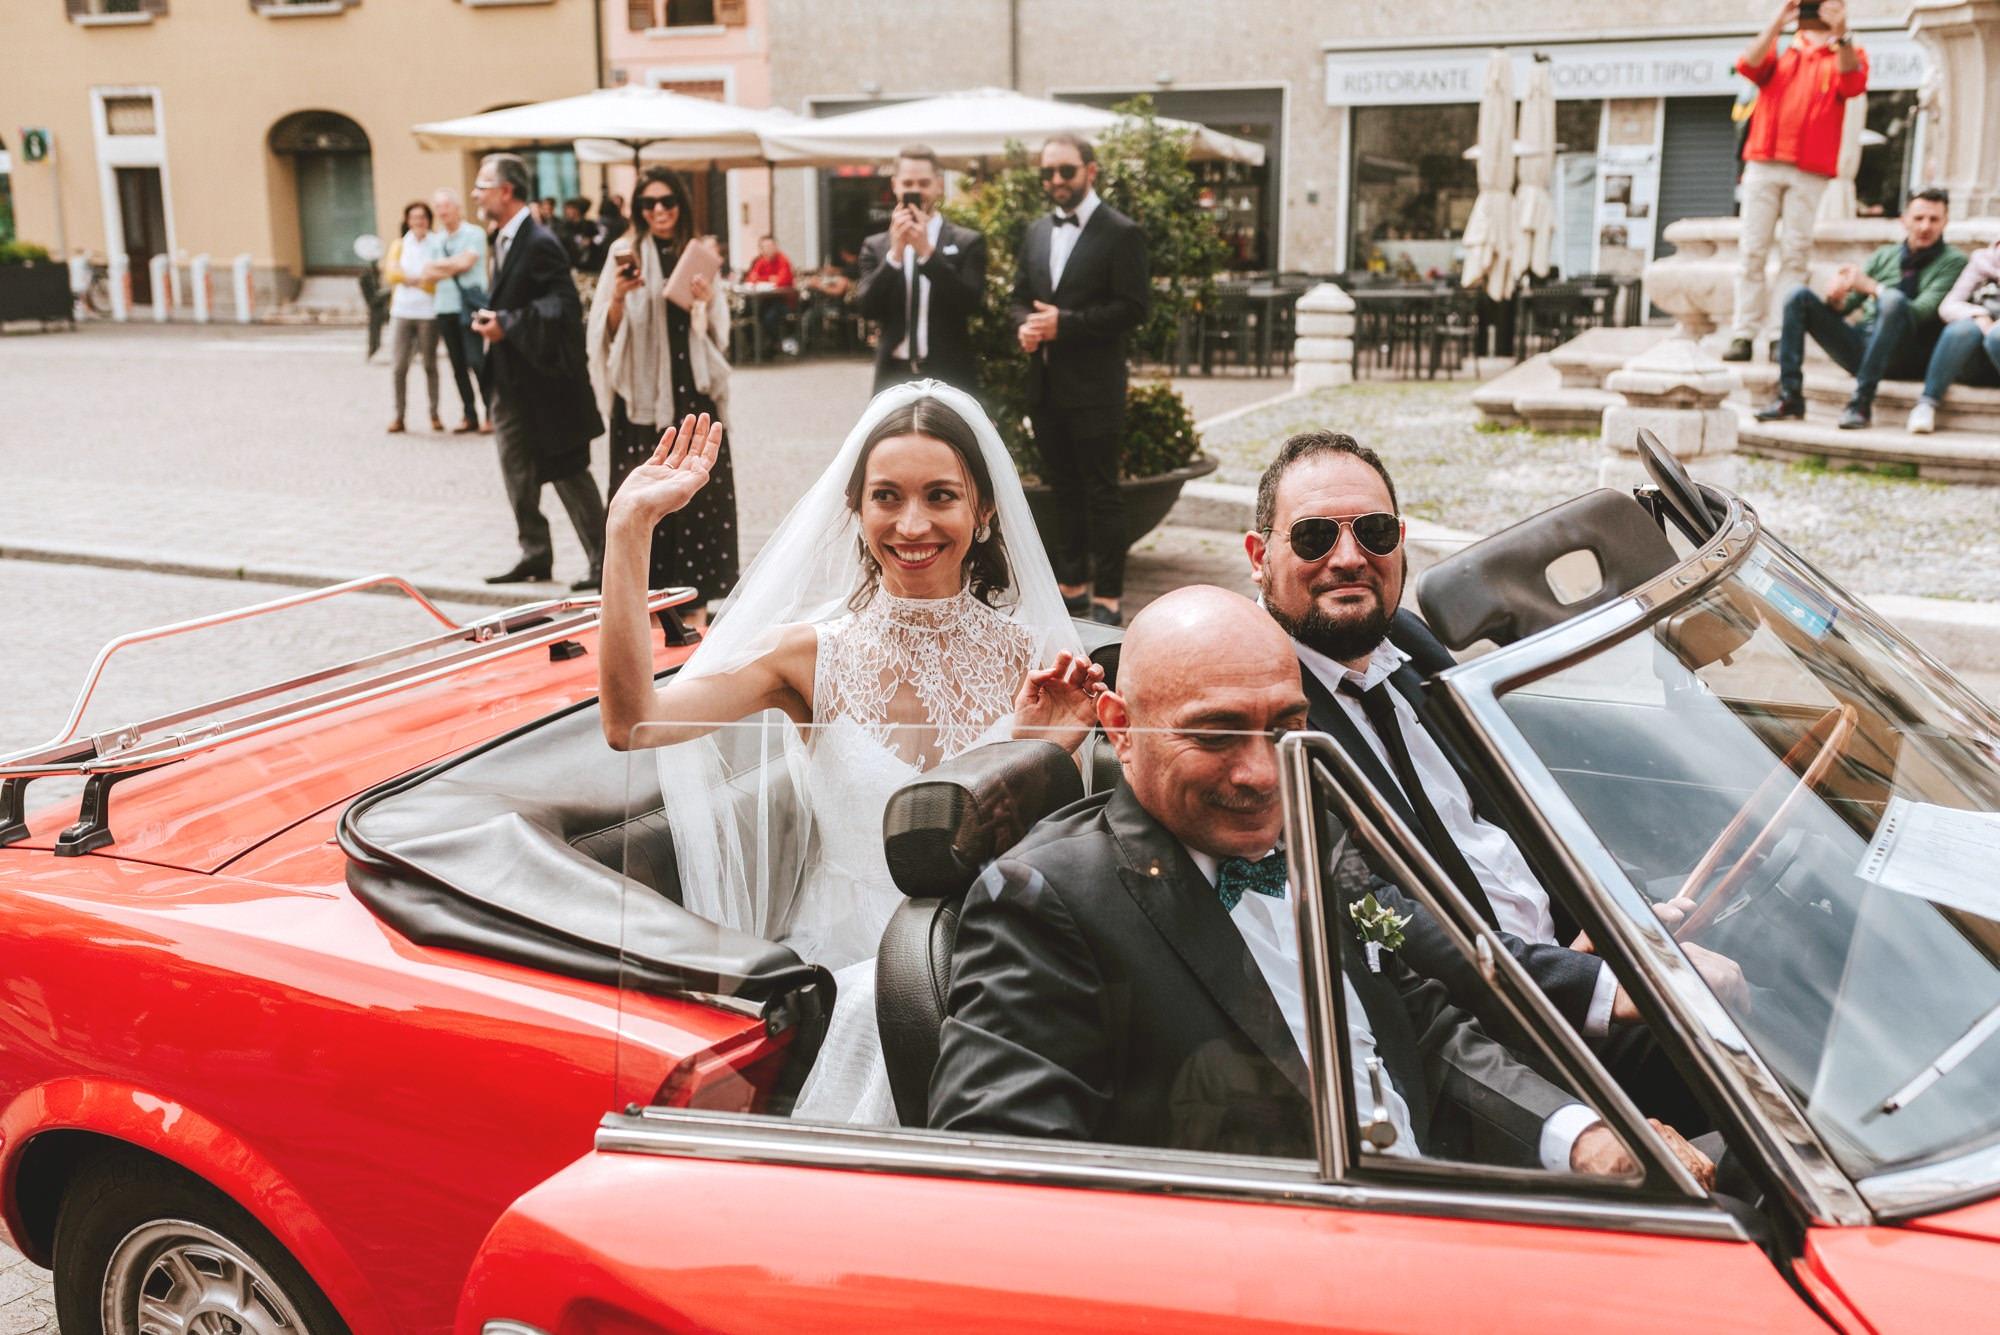 FOTO+PHOTO+BODA+WEDDING+ITALIA+ITALY+MAURICIO+GARAY+MAURICIOGARAY+WEDDINPHOTOGRAPHER+FOTOGRAFODEBODA-678.jpg